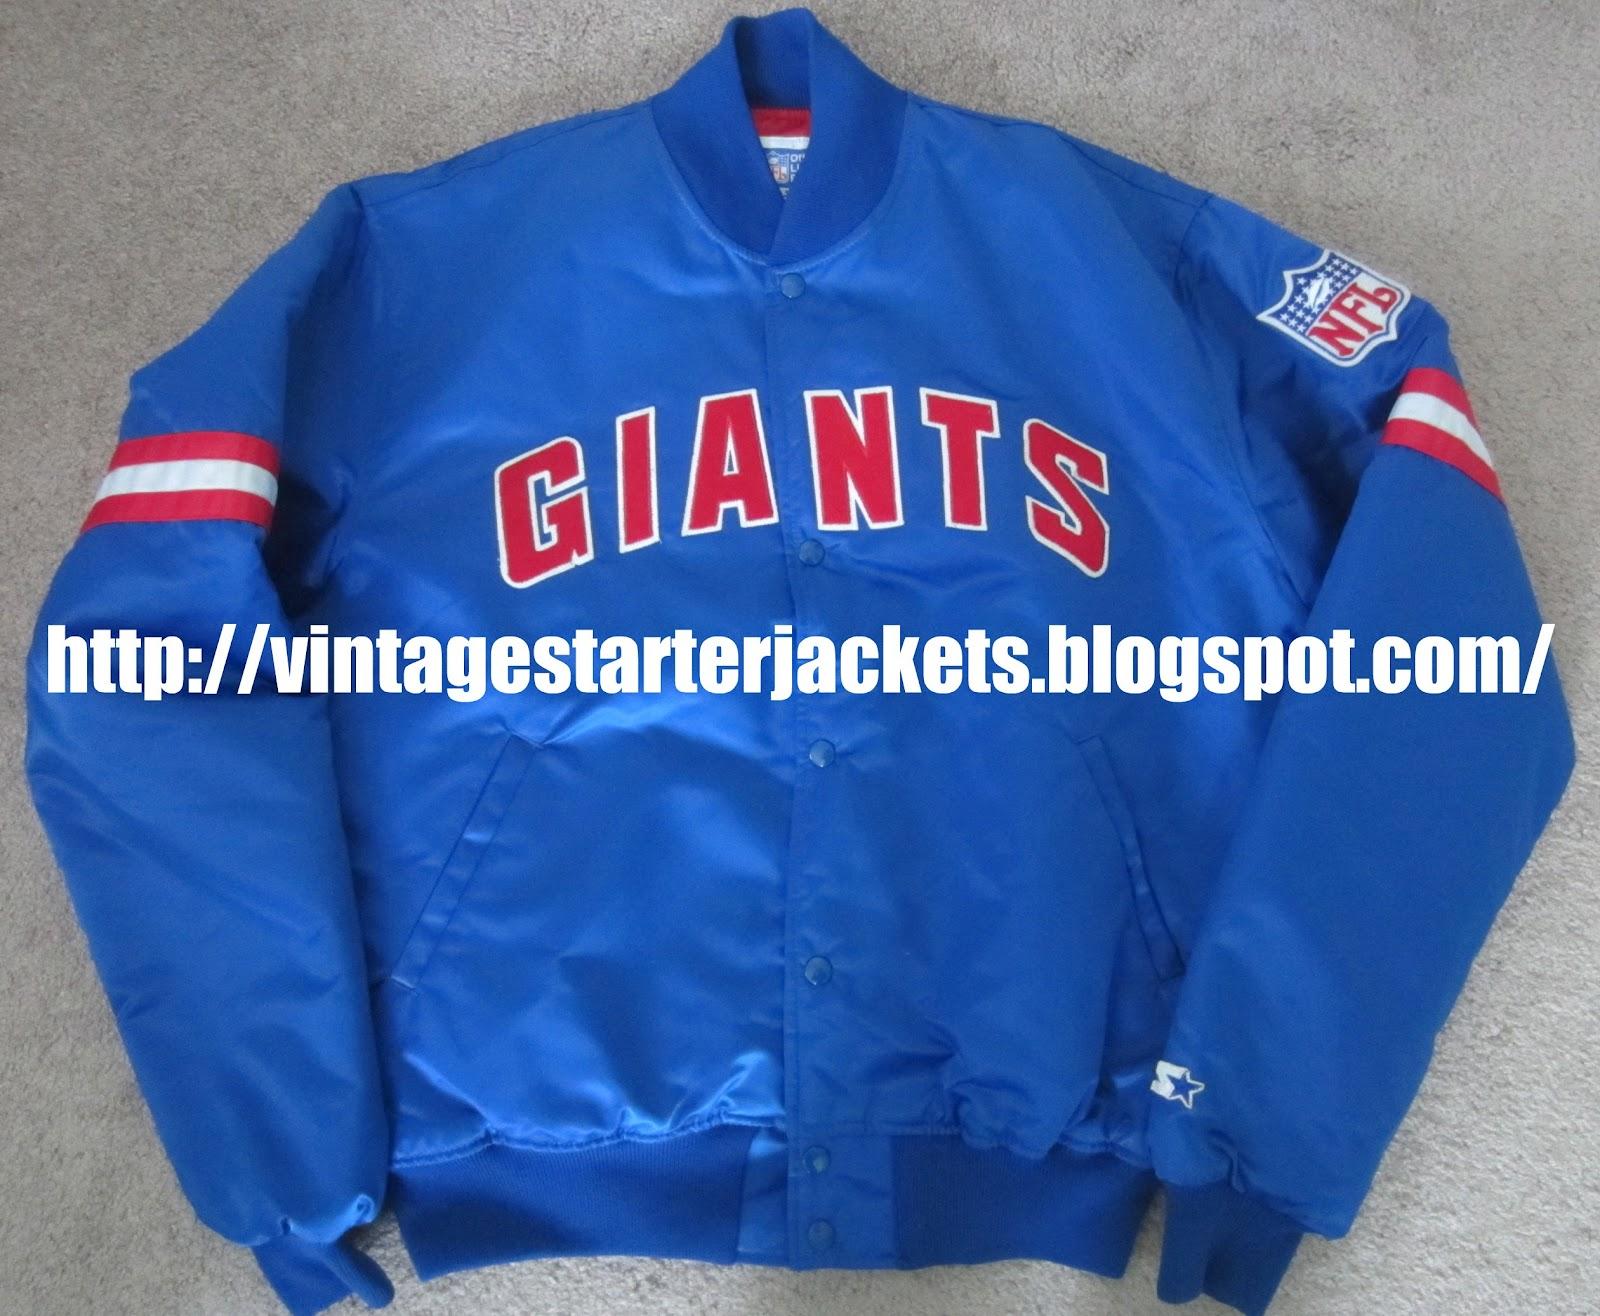 2a3da3c7b Vintage New York Giants Satin Starter Jacket Size XL - SOLD OUT ...